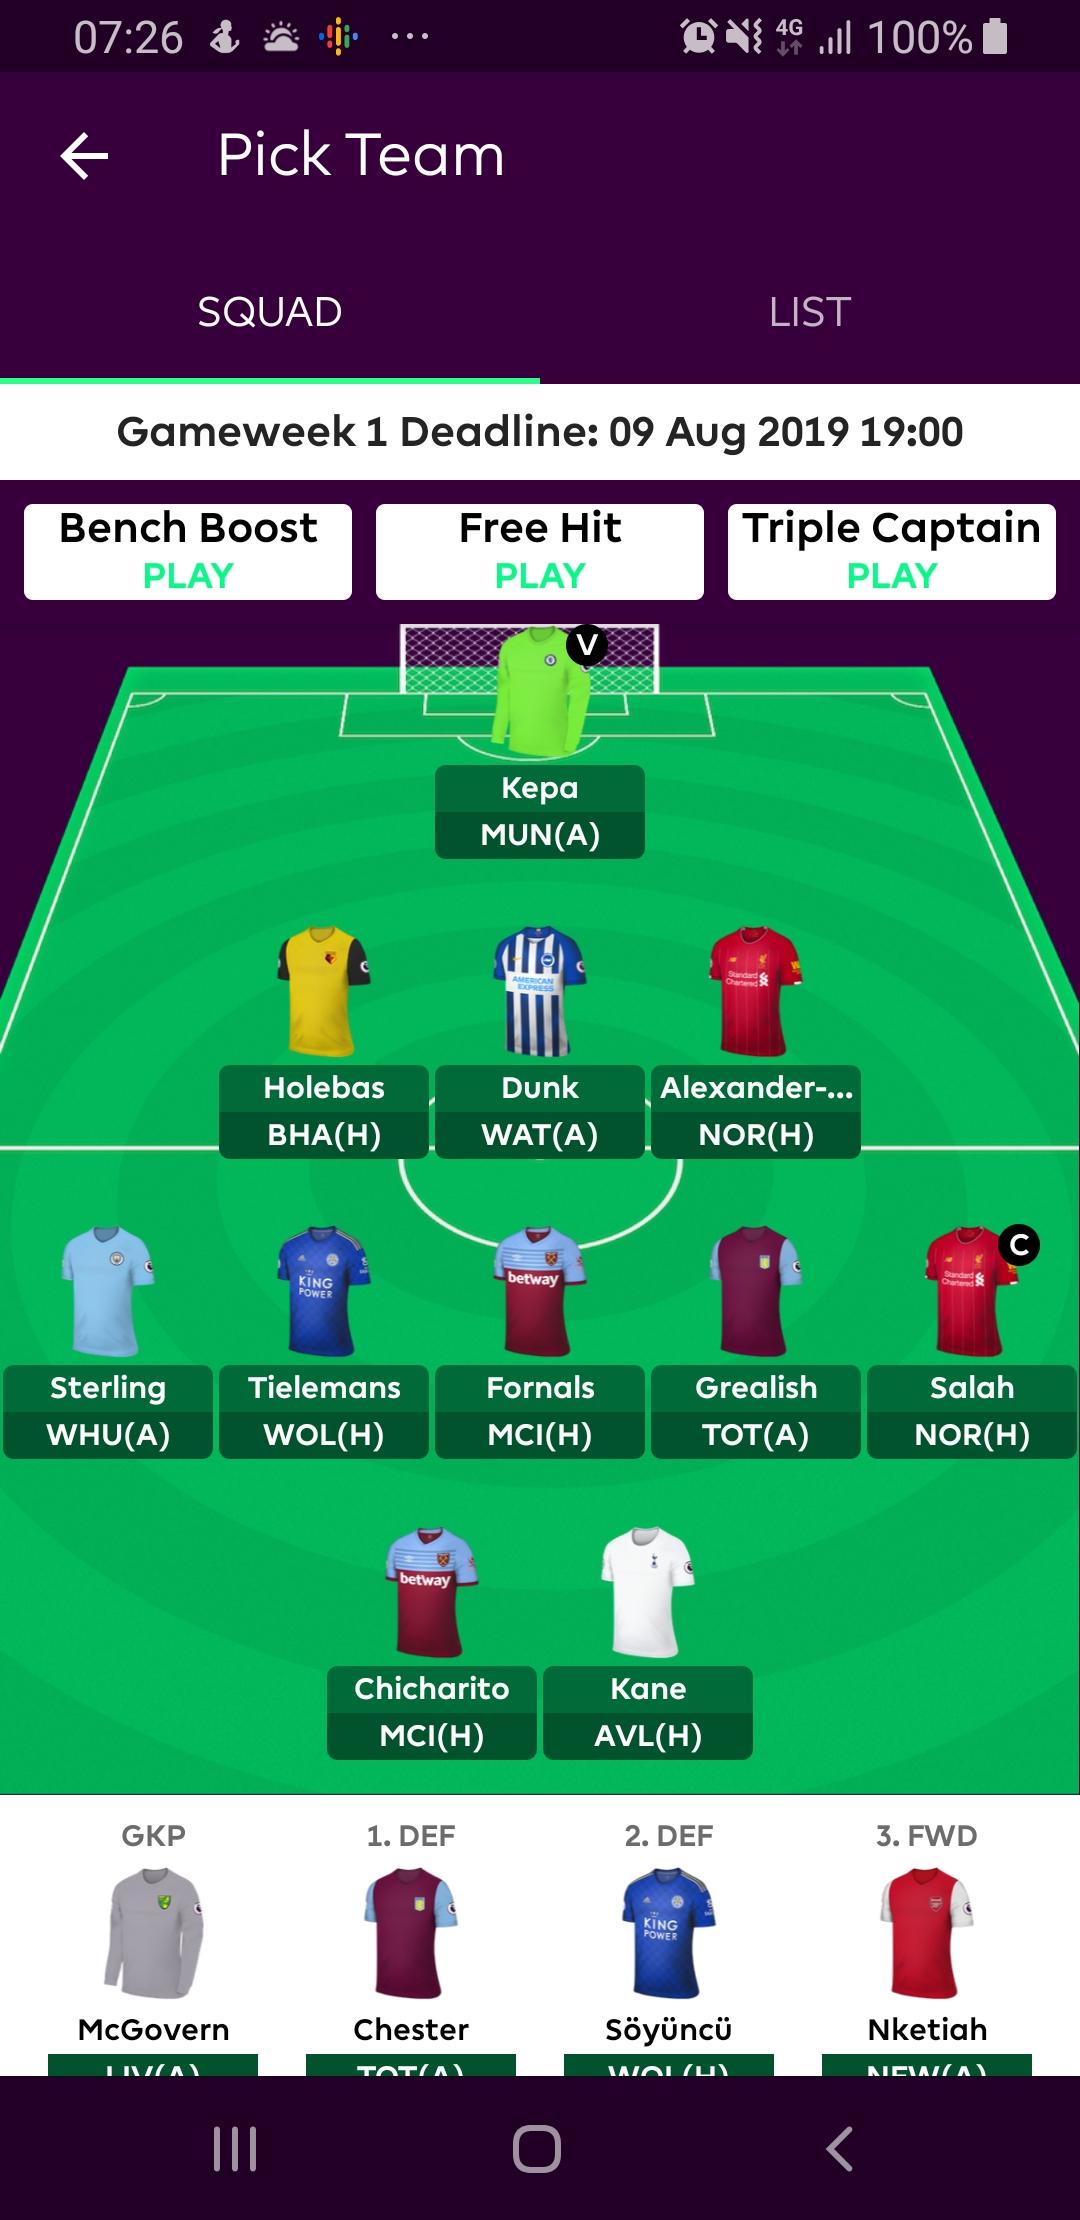 Fantasy Football 19/20 - Play On! - Online Arsenal Community